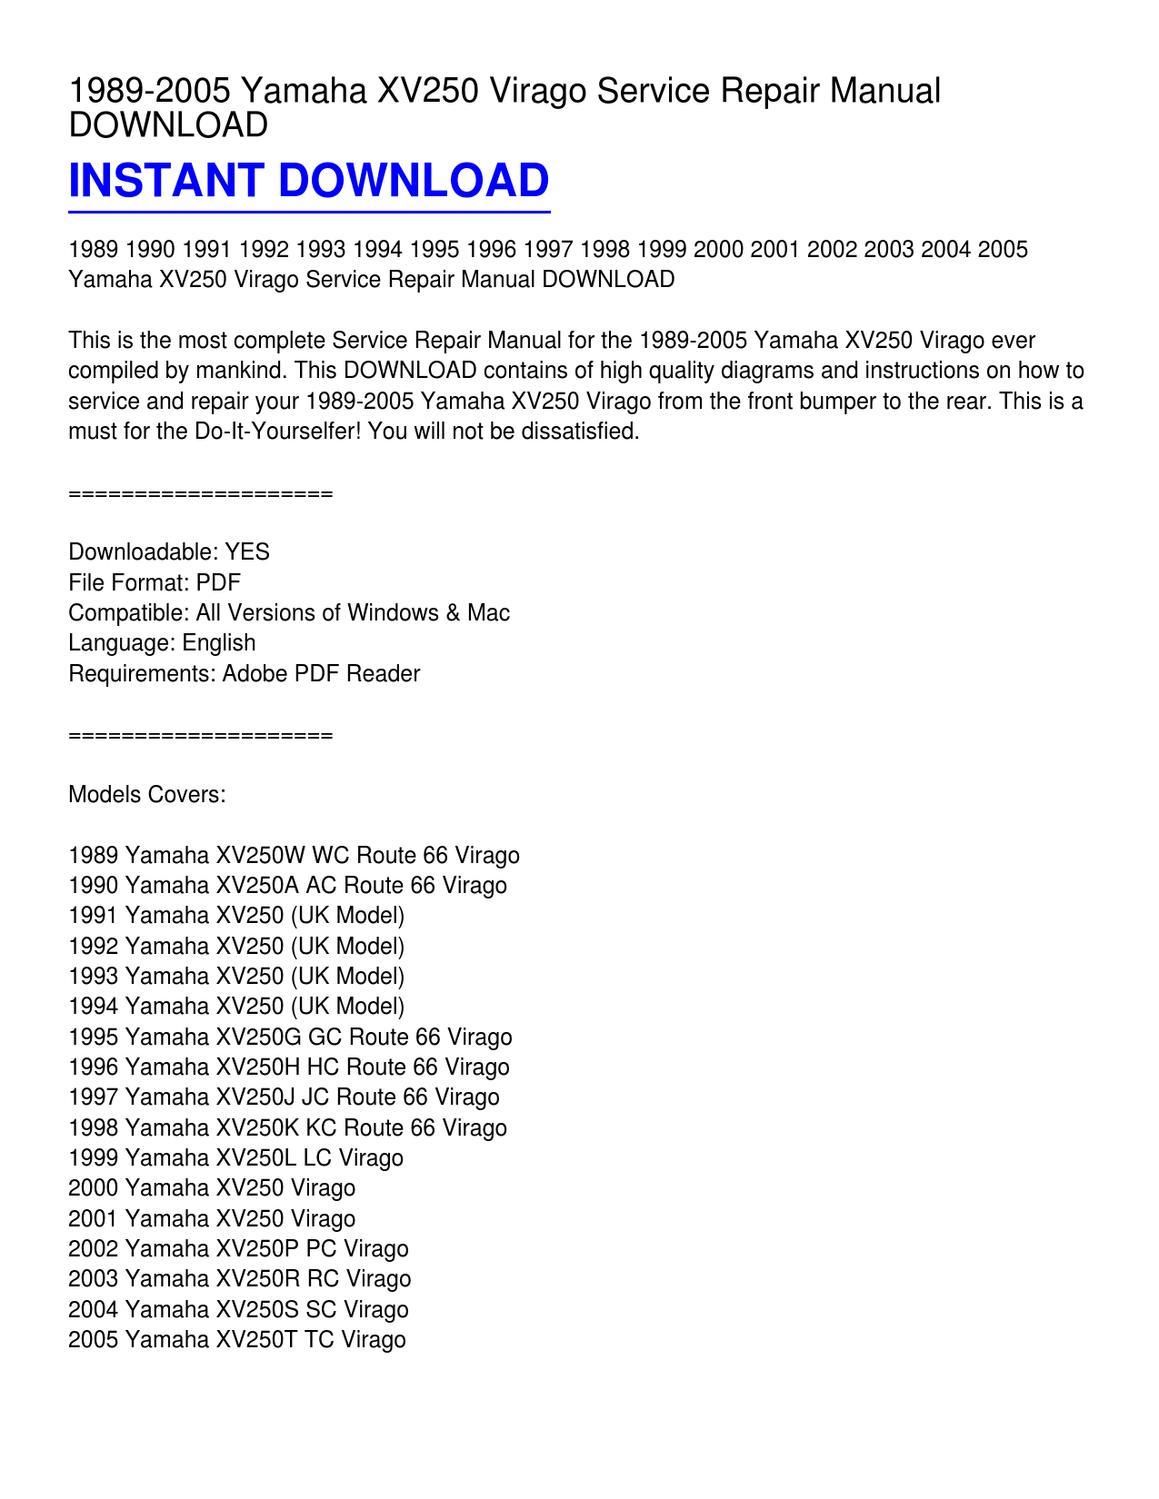 1989-2005 Yamaha XV250 Virago Service Repair Manual DOWNLOAD by Edgardo  Pendley - issuu